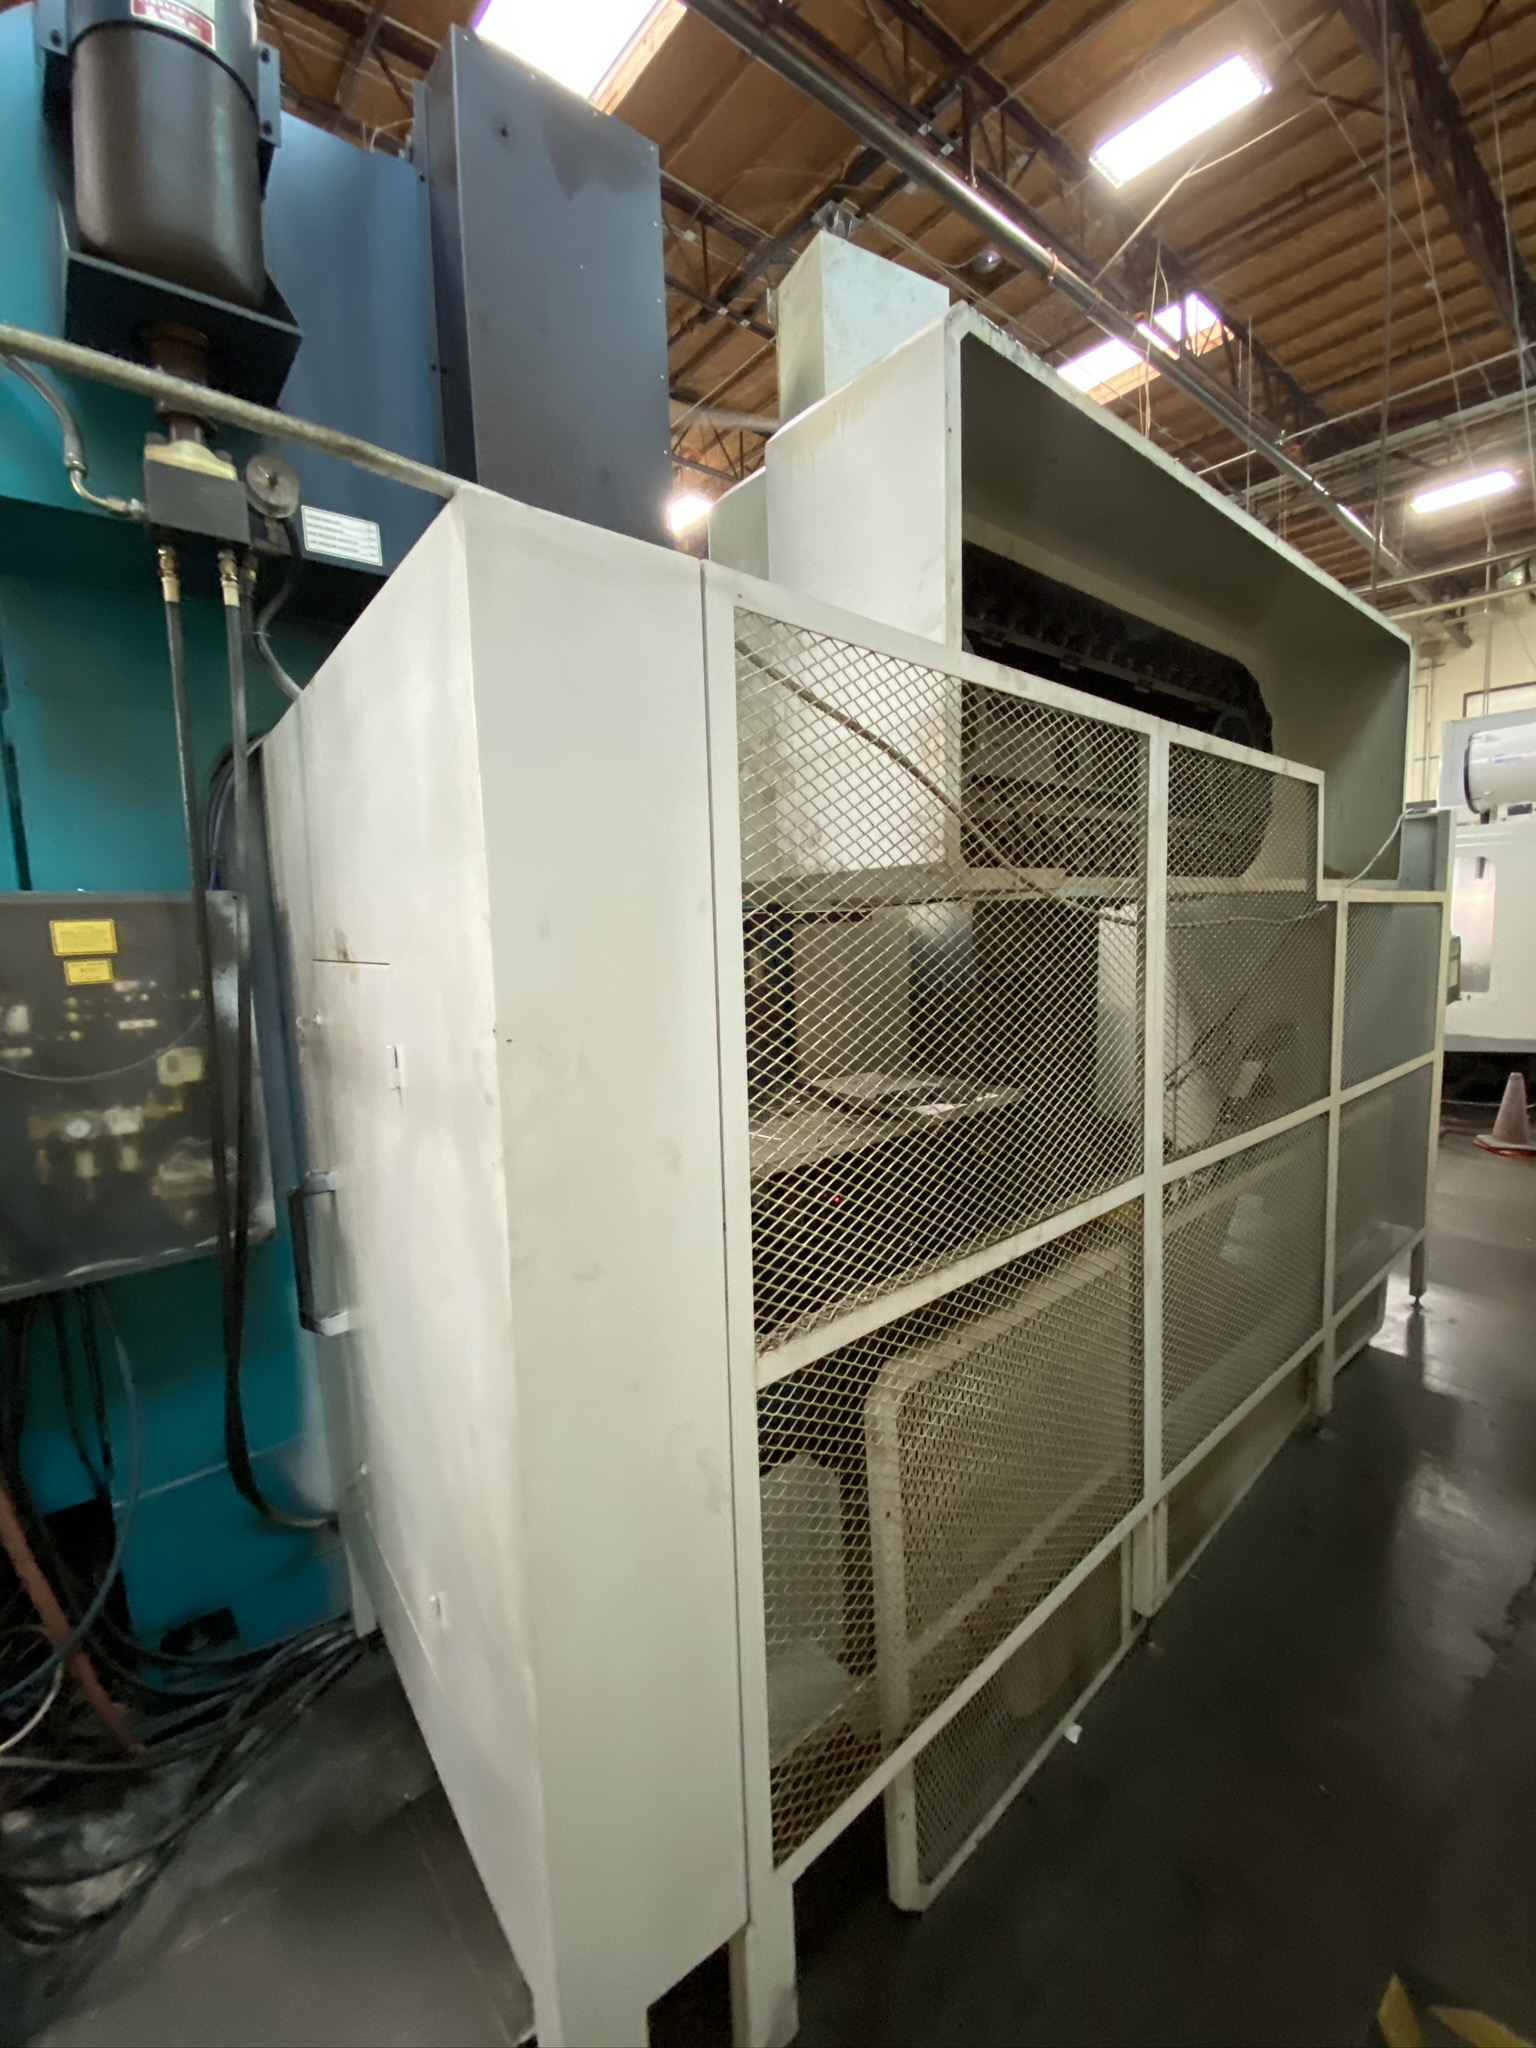 2005 SIGMA CNC DOUBLE COLUMN MACHINING CENTER, MODEL SDV-3219, FANUC 18IMB CNC CONTROL - Image 12 of 31